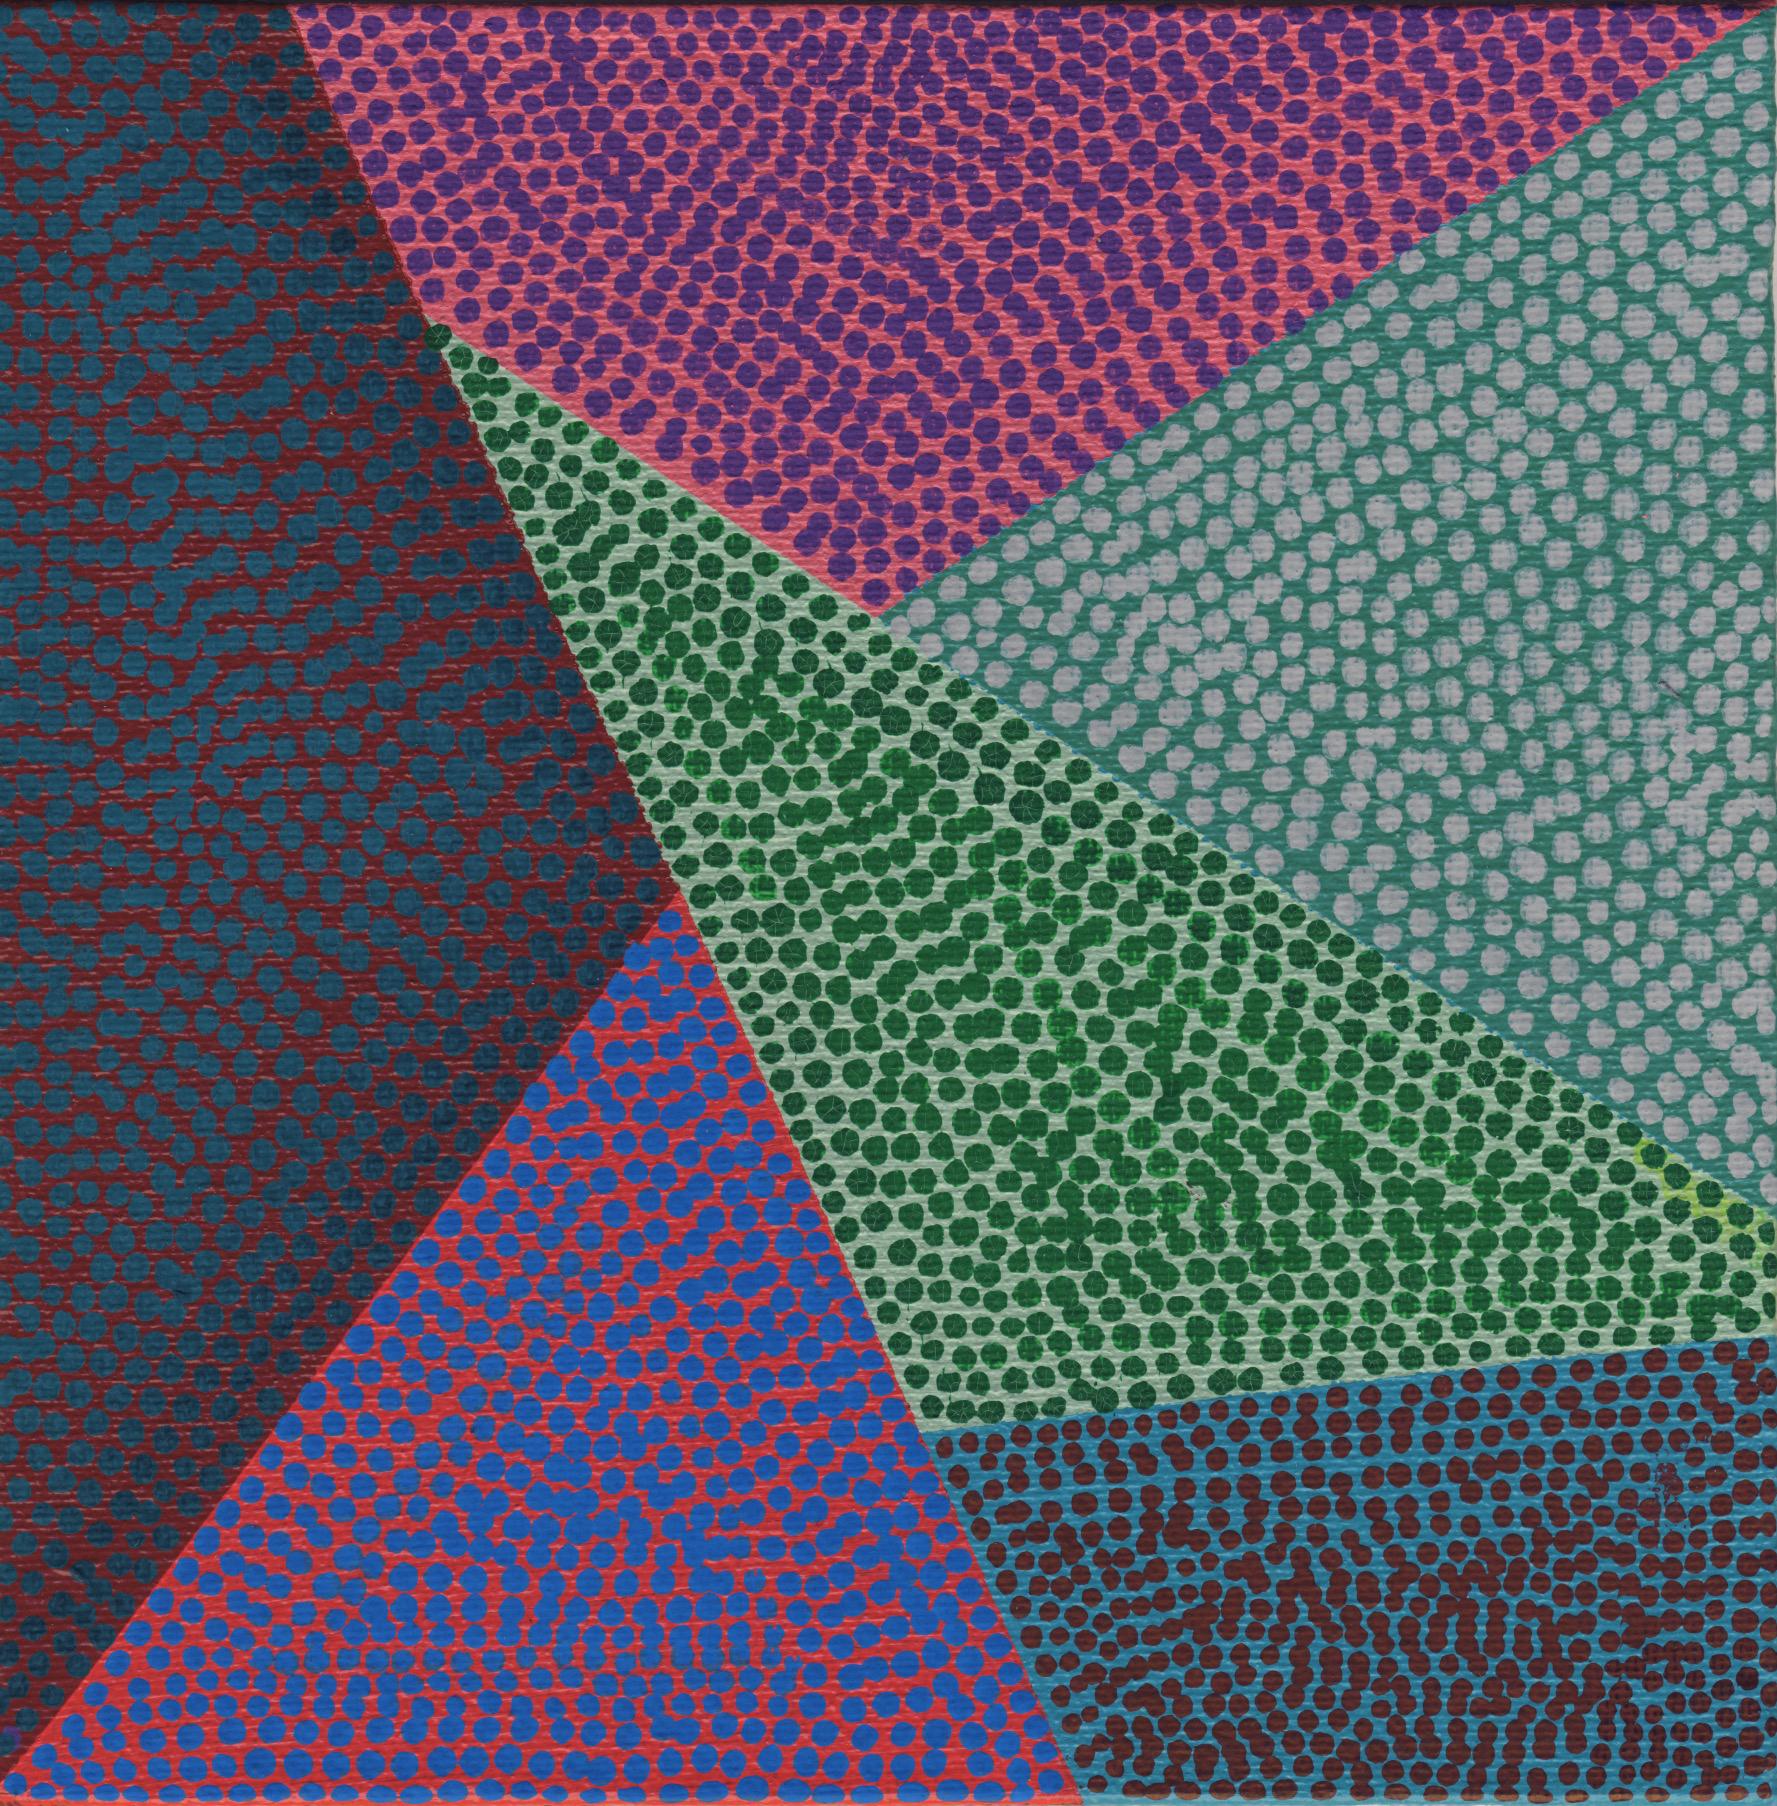 "92/100, Acrylic on canvas panel, 6"" X 6"", 4/8/19"